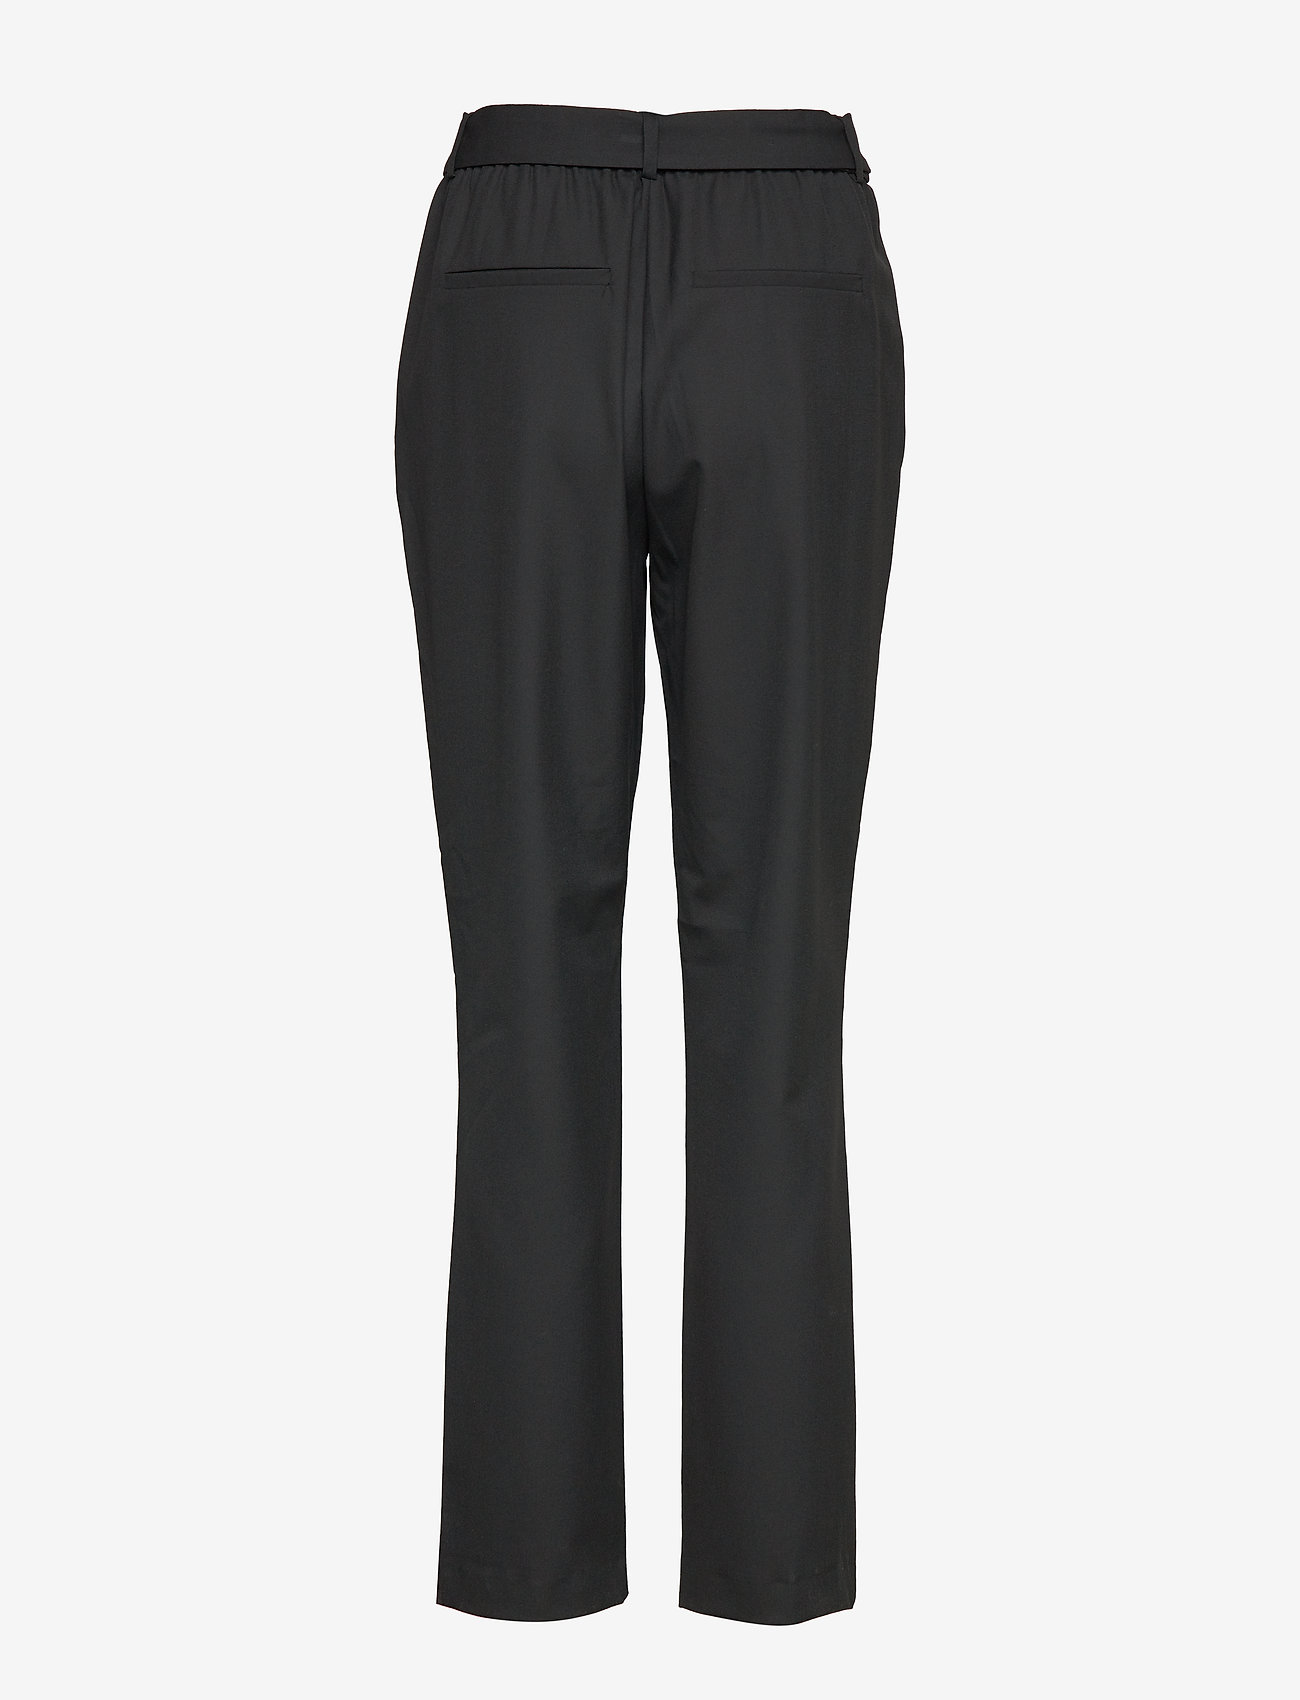 Selected Femme - SLFBIO KIPAS MW PANT NOOS - straight leg trousers - black - 1